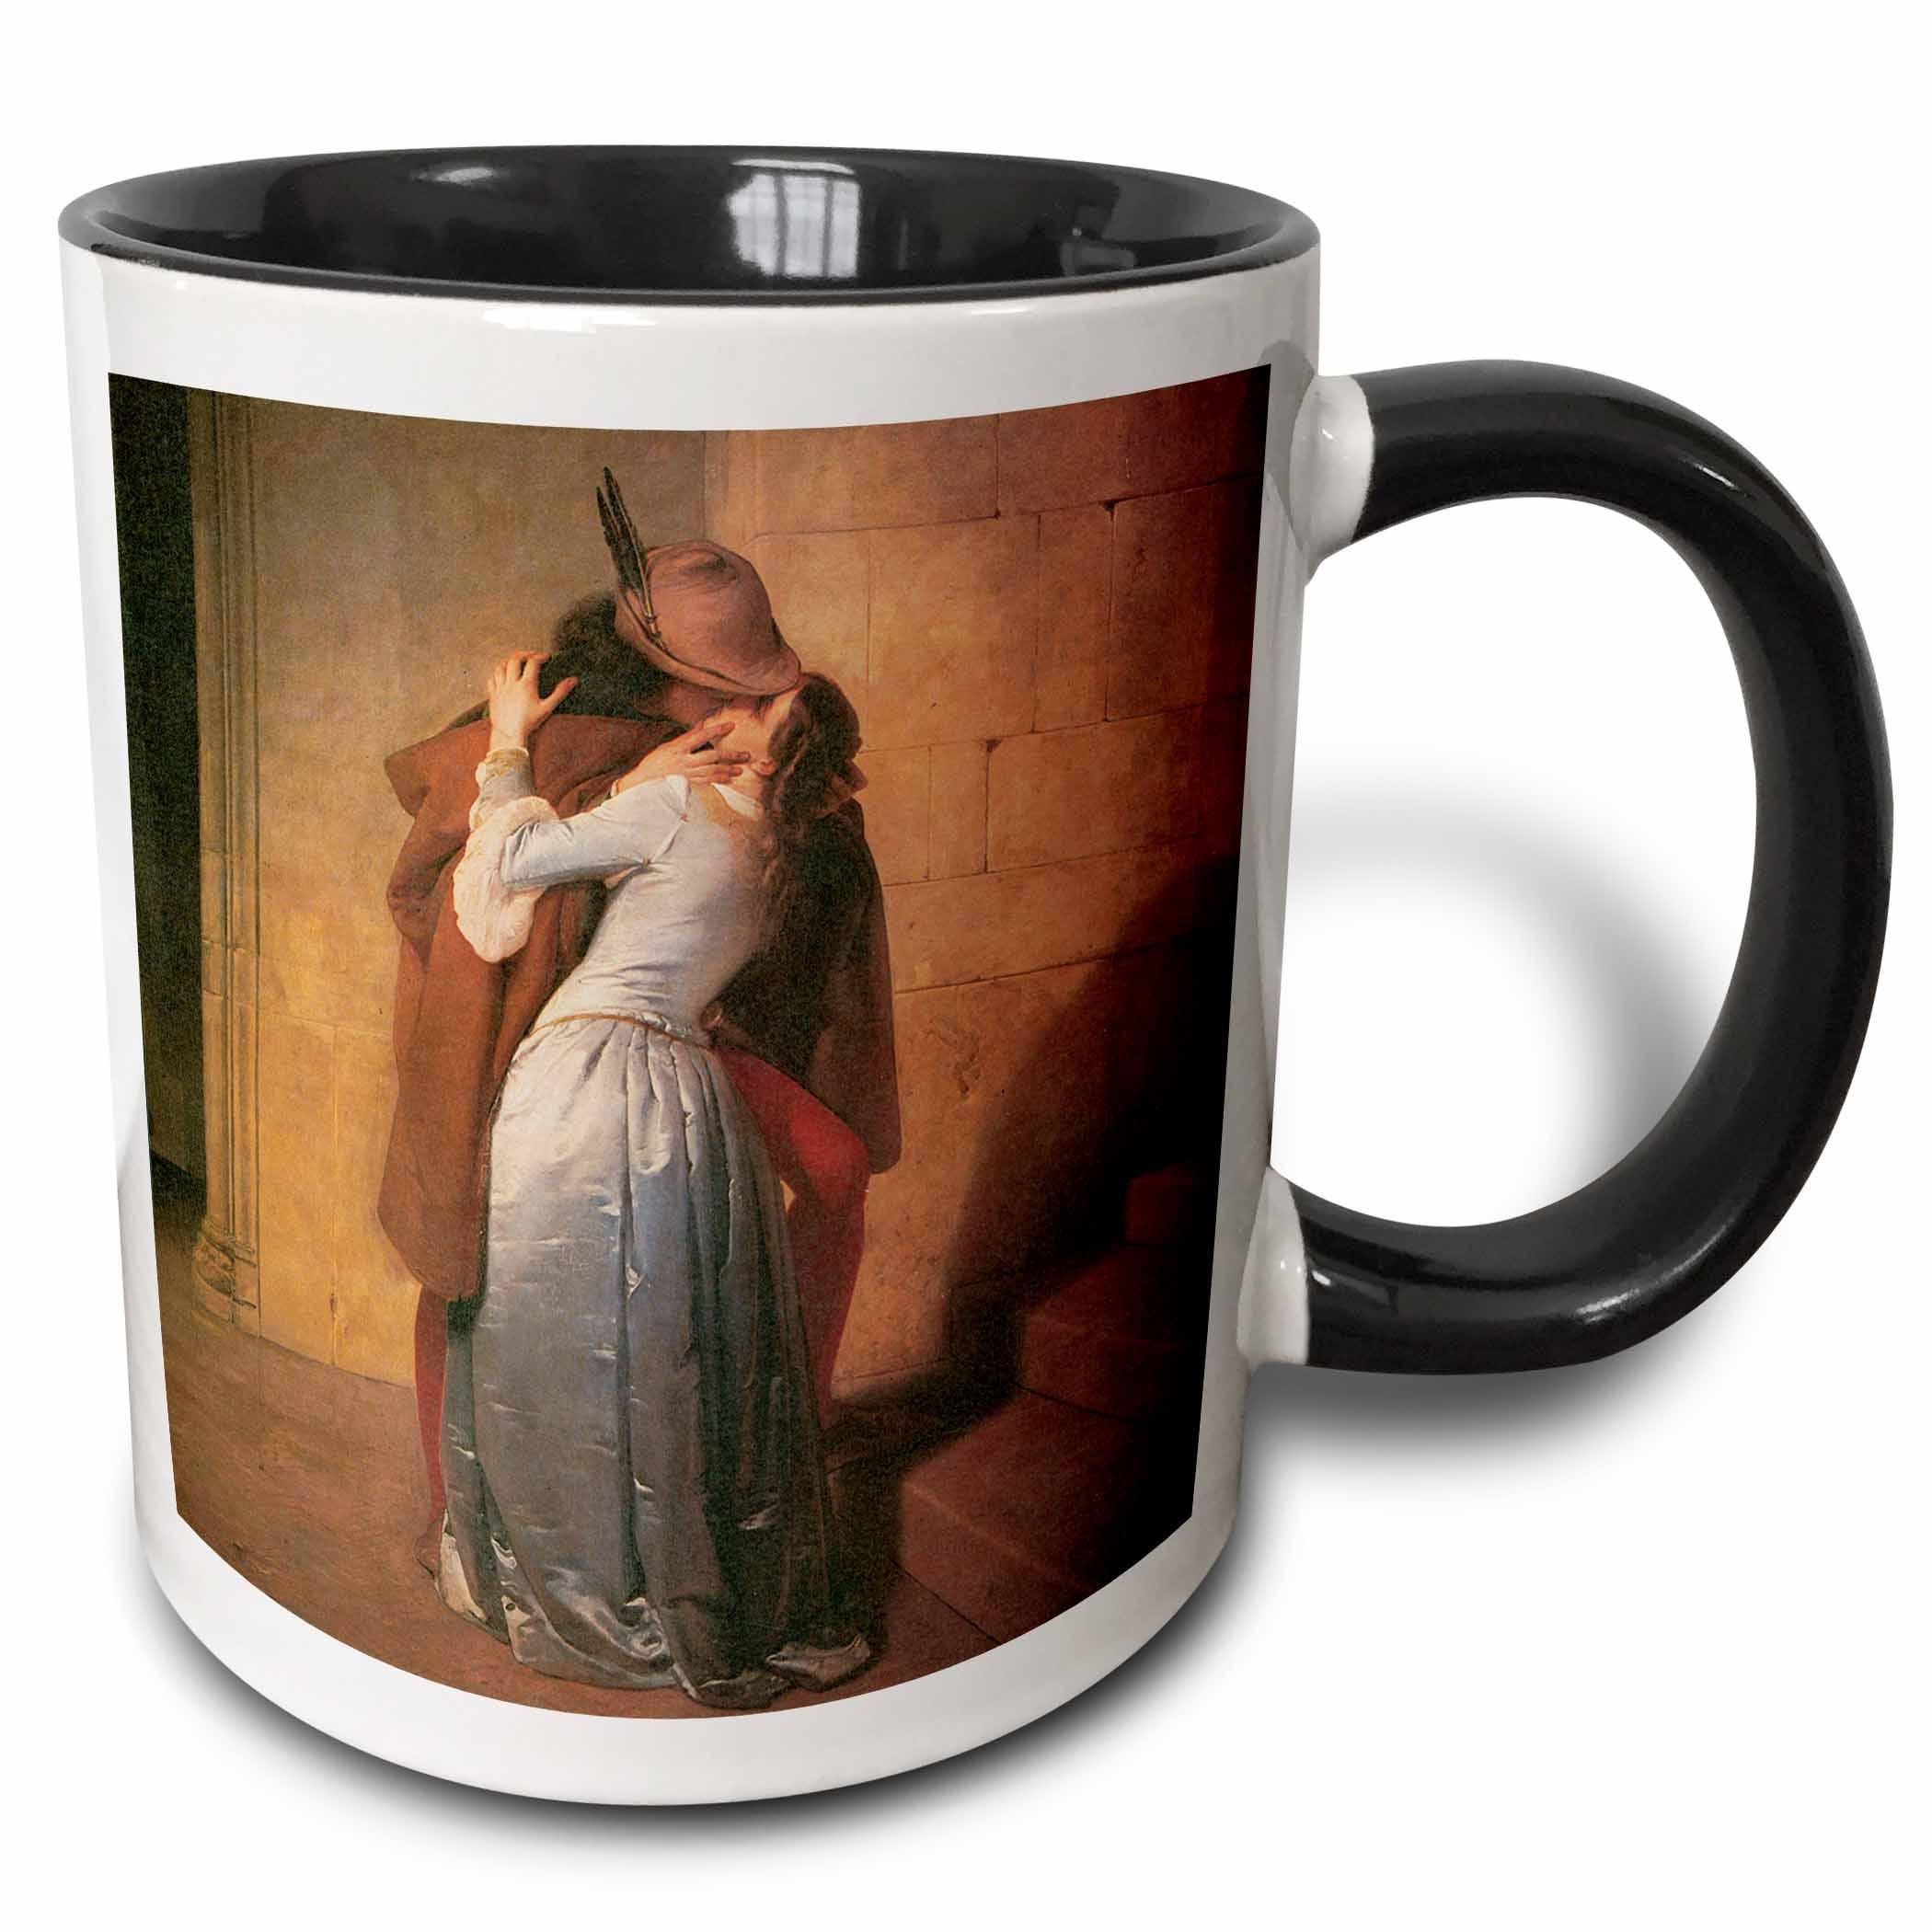 3drose The Kiss By Francesco Hayez Two Tone Black Mug